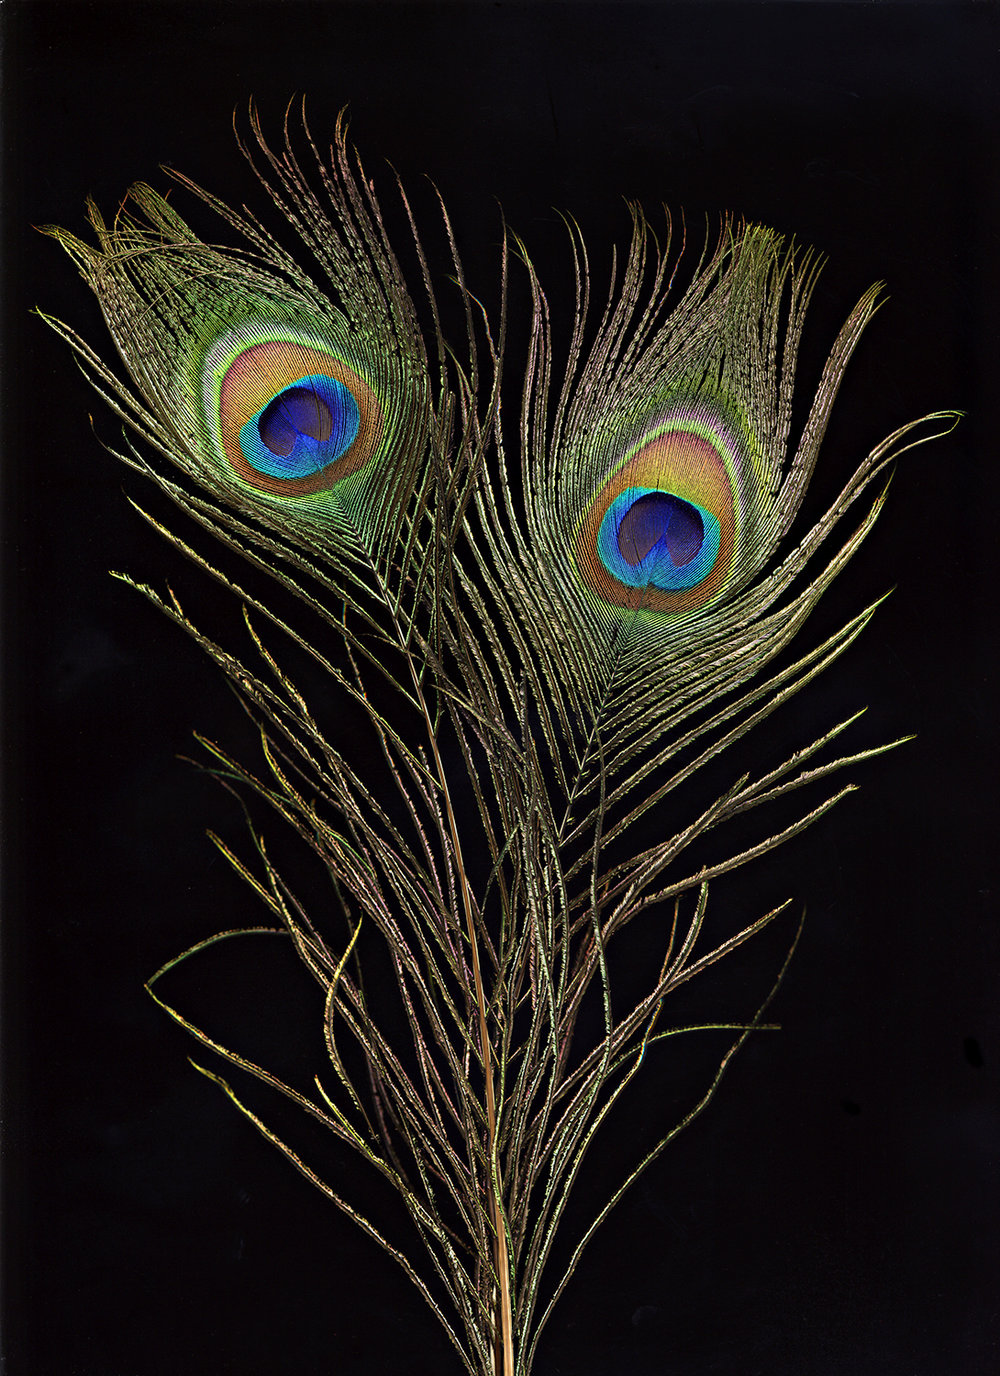 peacock_feather_copy_original.jpg